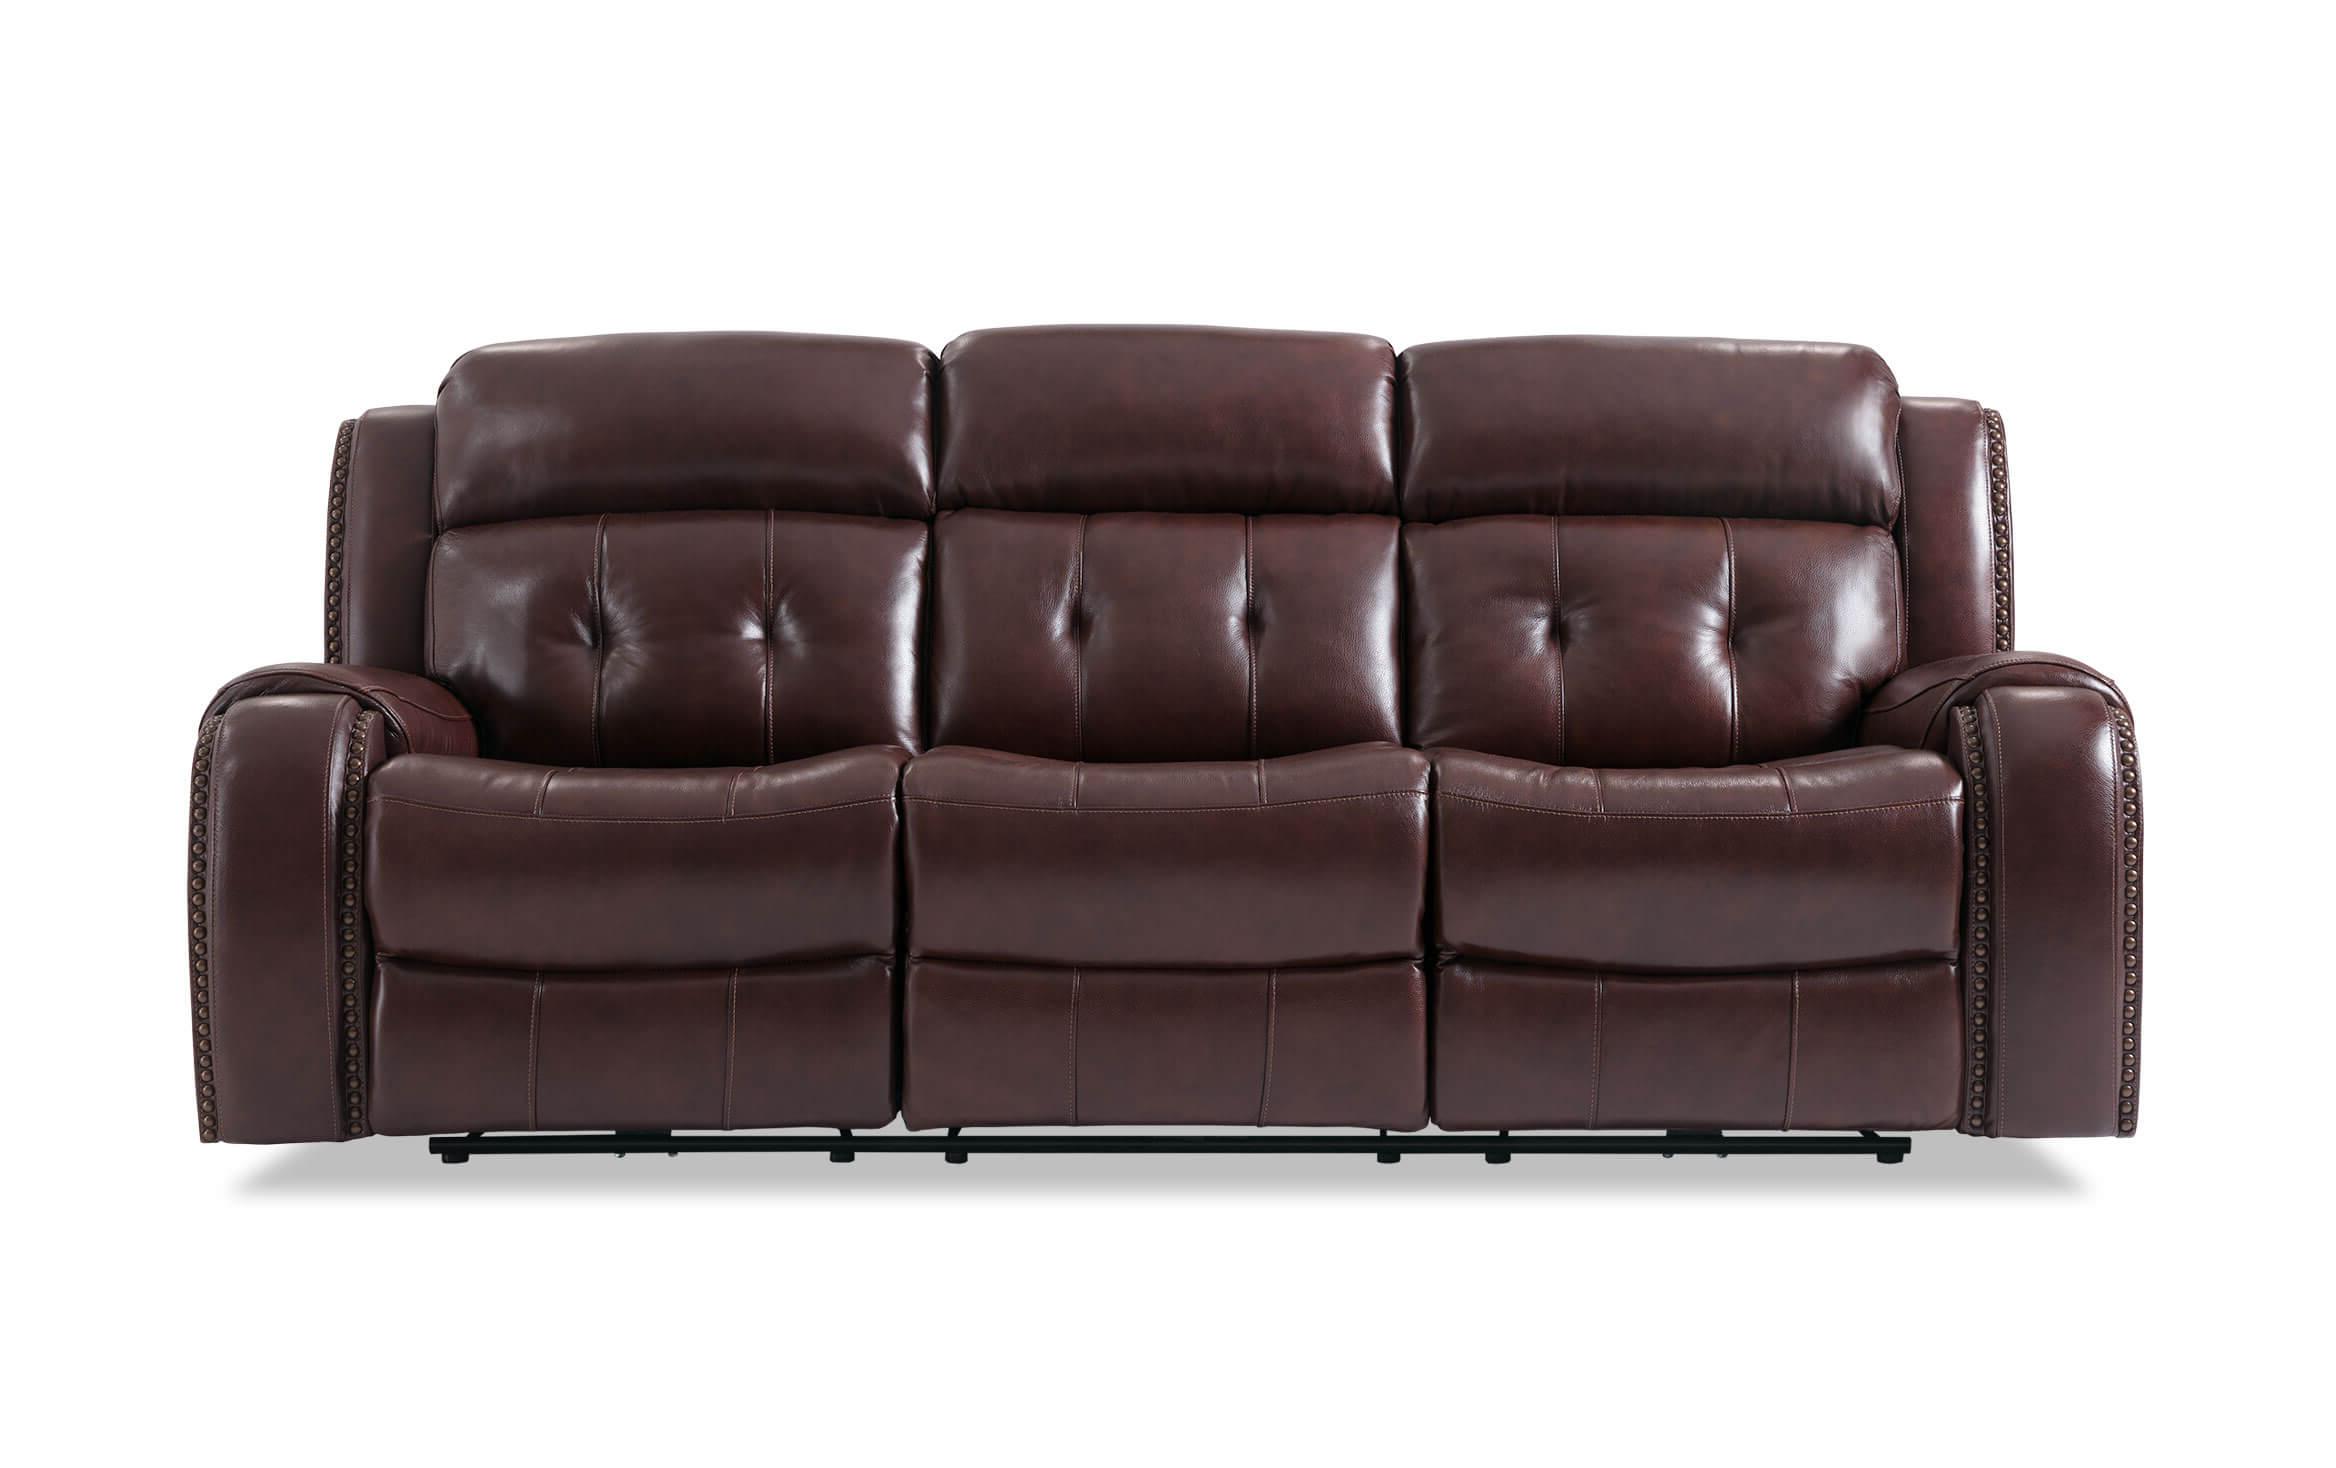 Trailblazer Gray Leather Power Reclining Sofas Inside Most Popular Bobs Furniture Leather Sofa : Trailblazer Gray Leather (View 4 of 15)